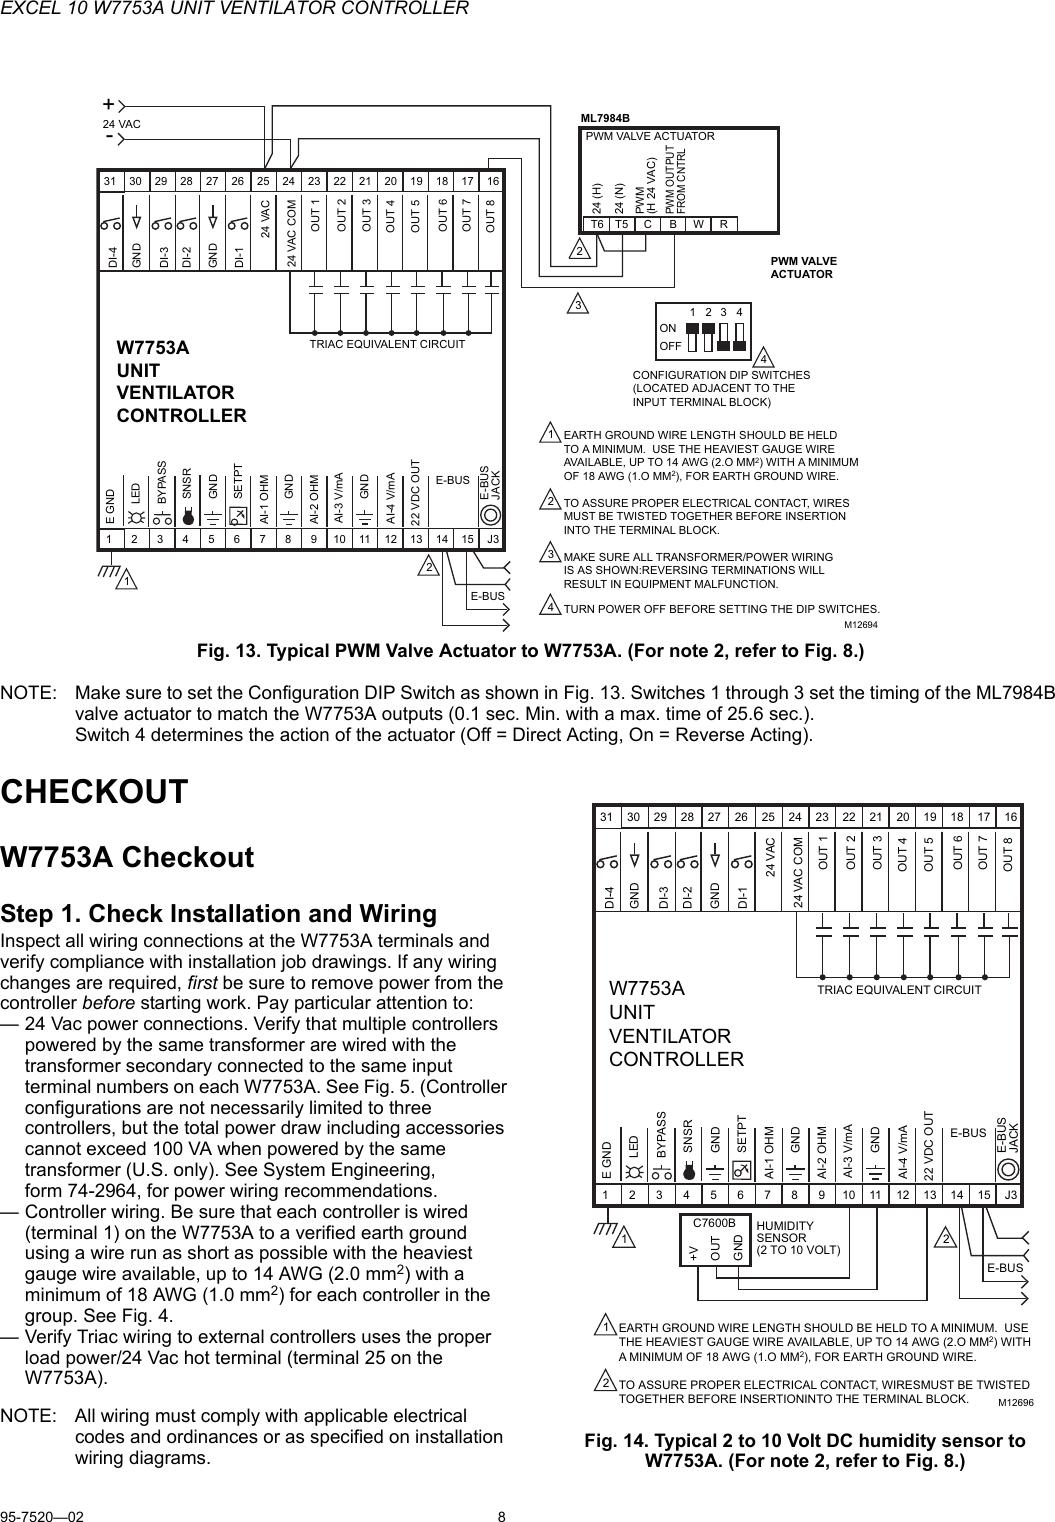 Mk Sentry Garage Consumer Unit Wiring Diagram